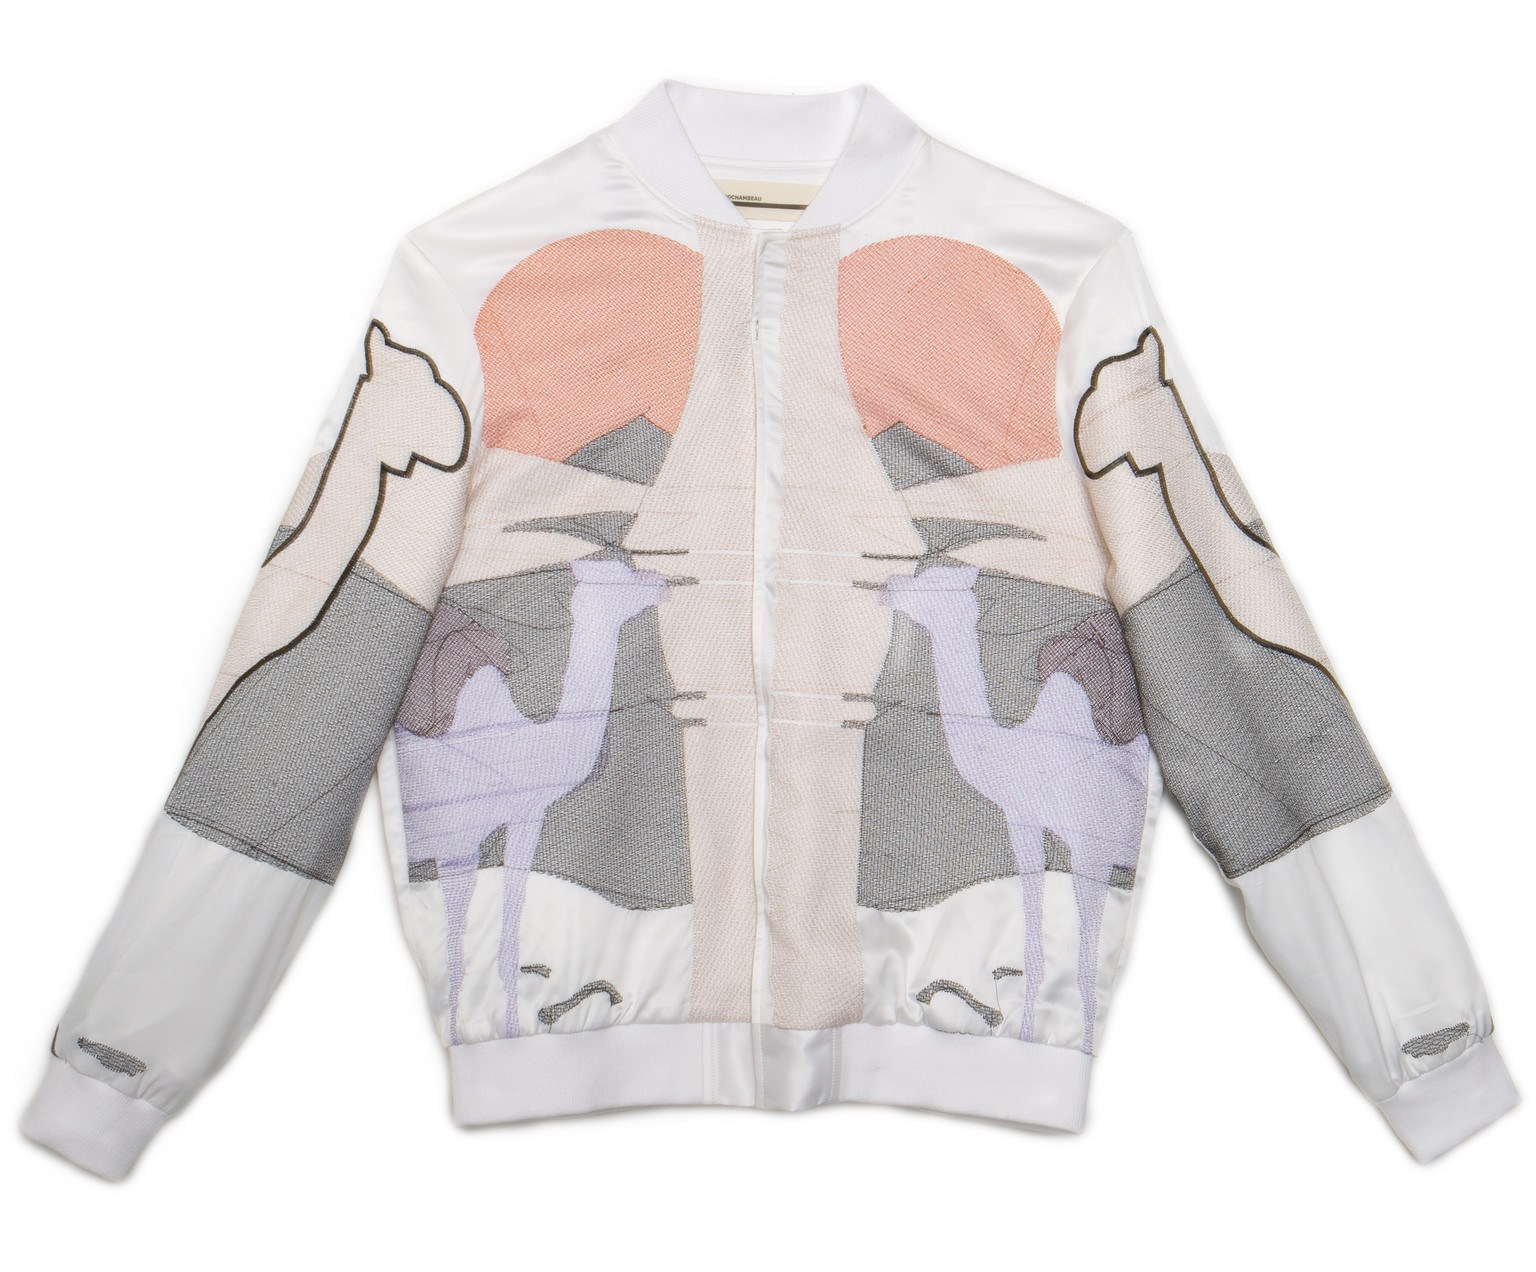 rochambeau-setting-sun-stones-bomber-jacket